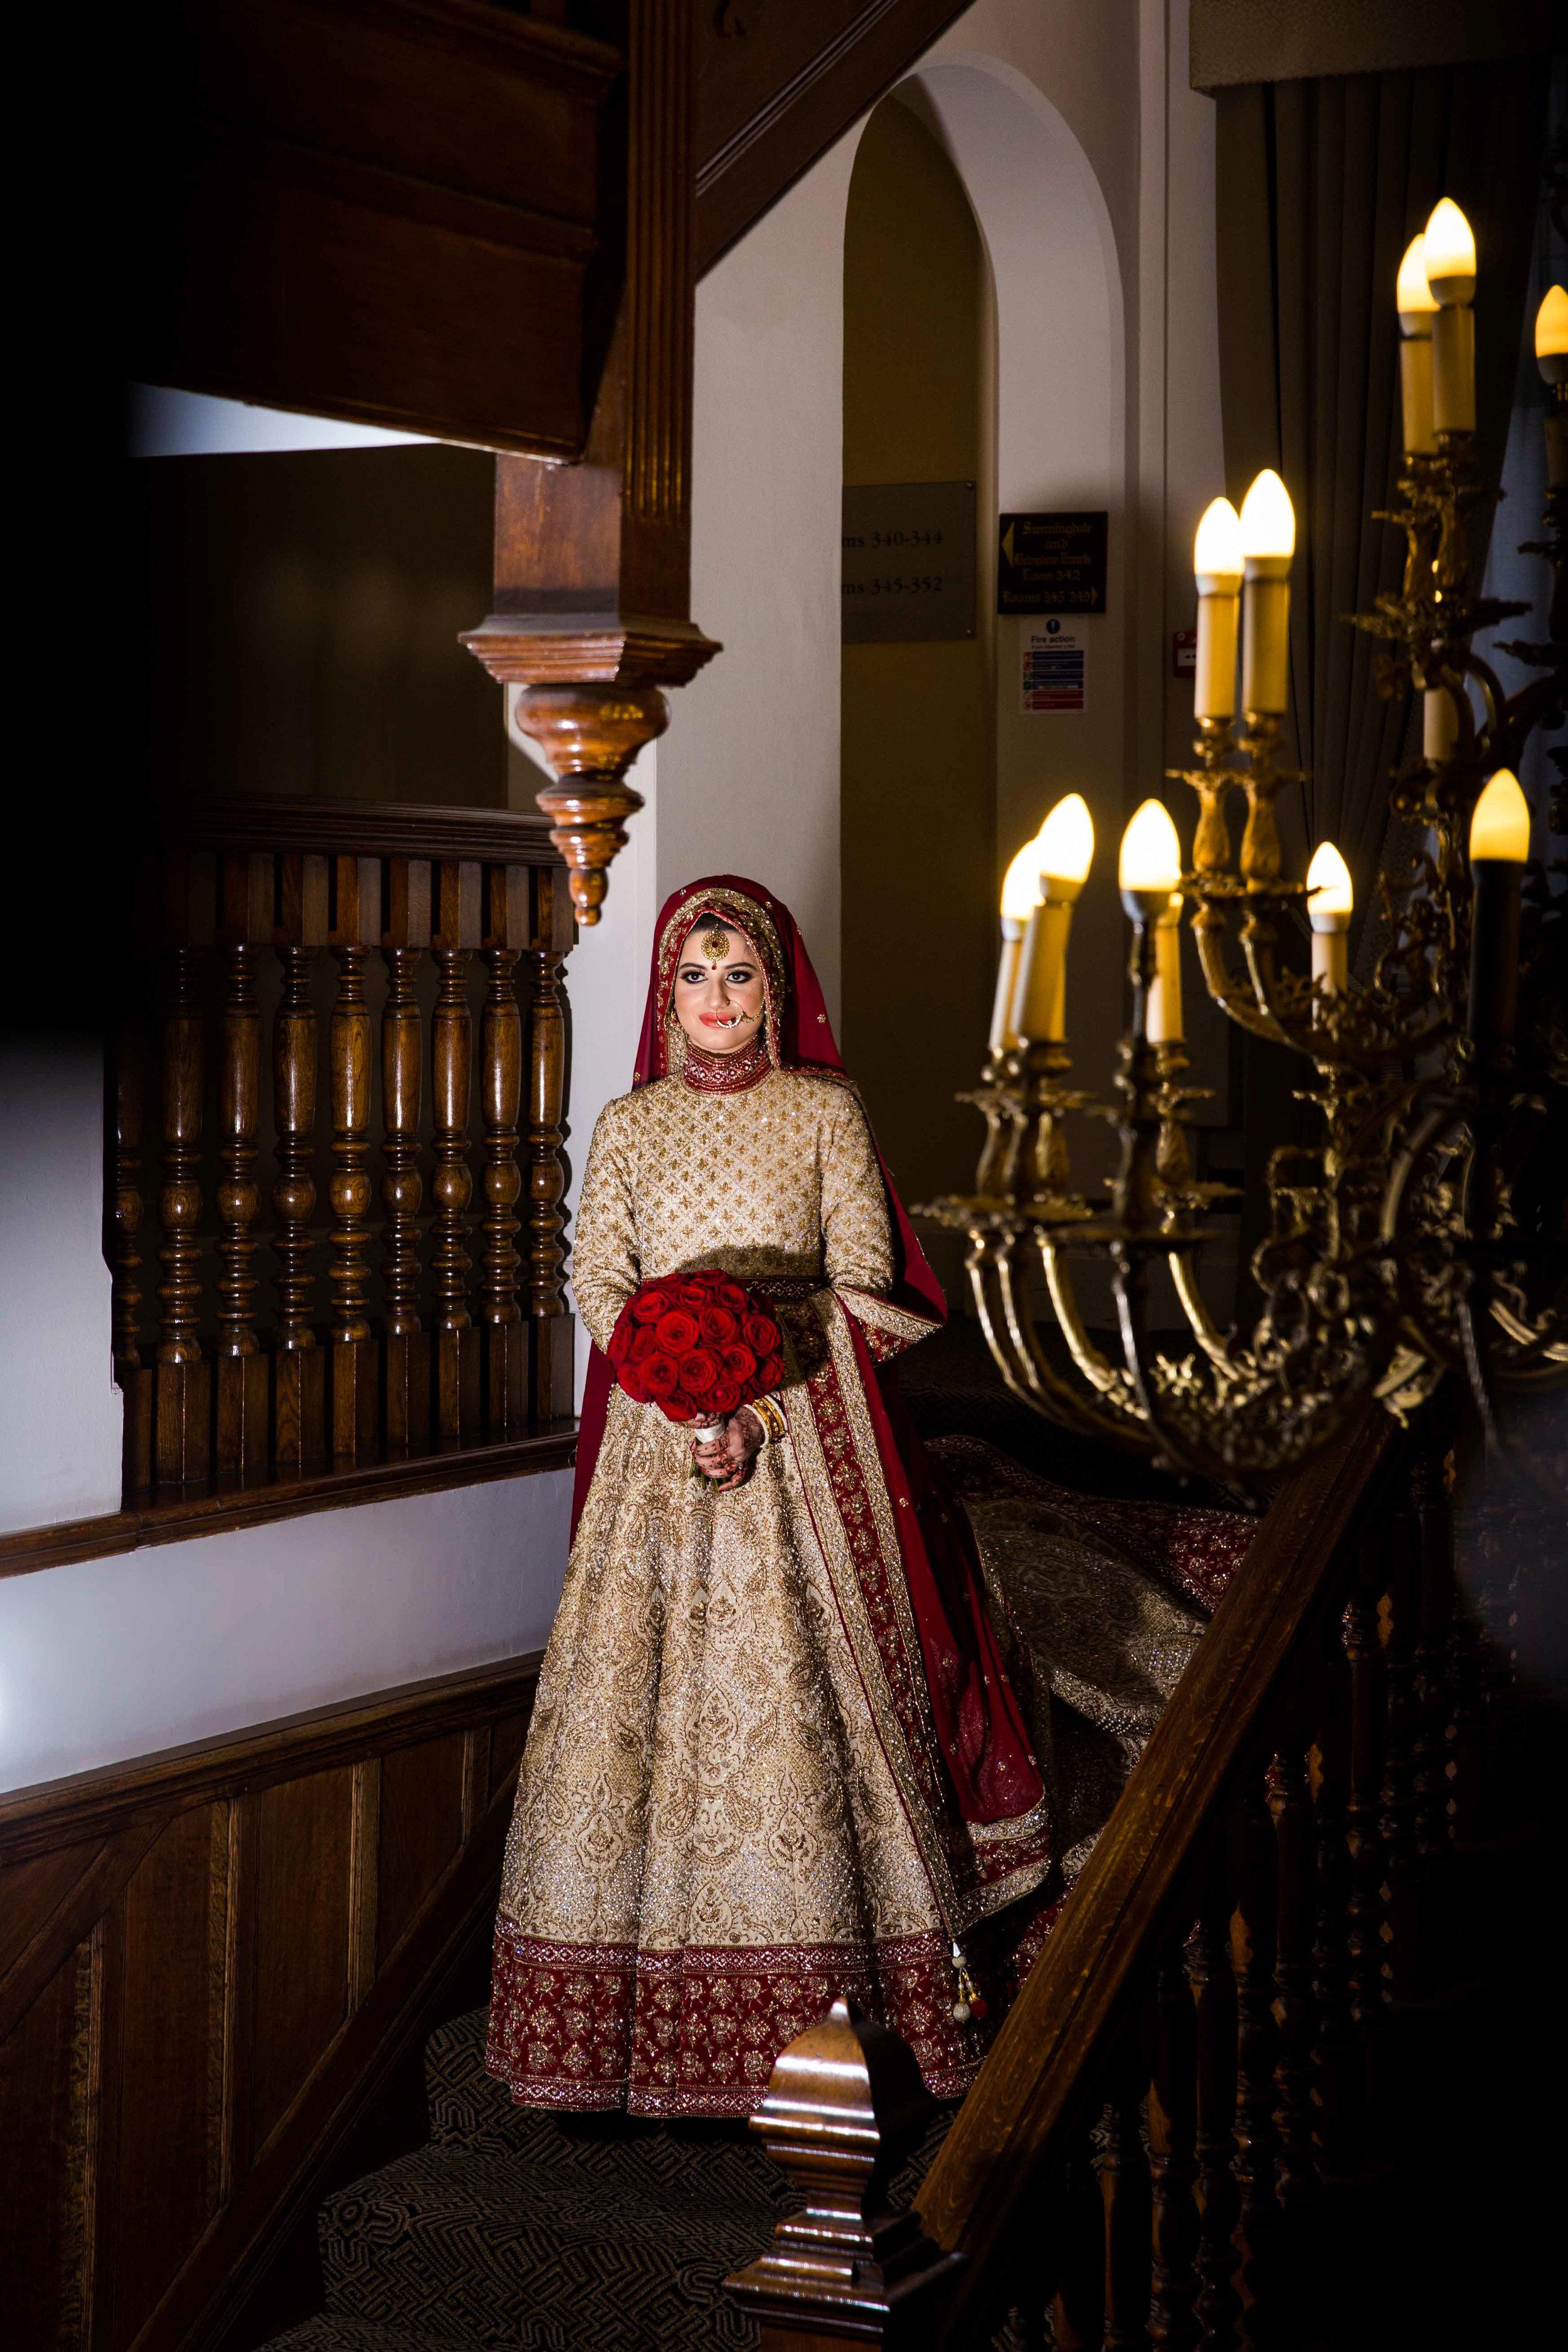 Macdonald-Berystede-Hotel-wedding-female-asian-wedding-photographer-london-natalia-smith-photography-21-2.jpg